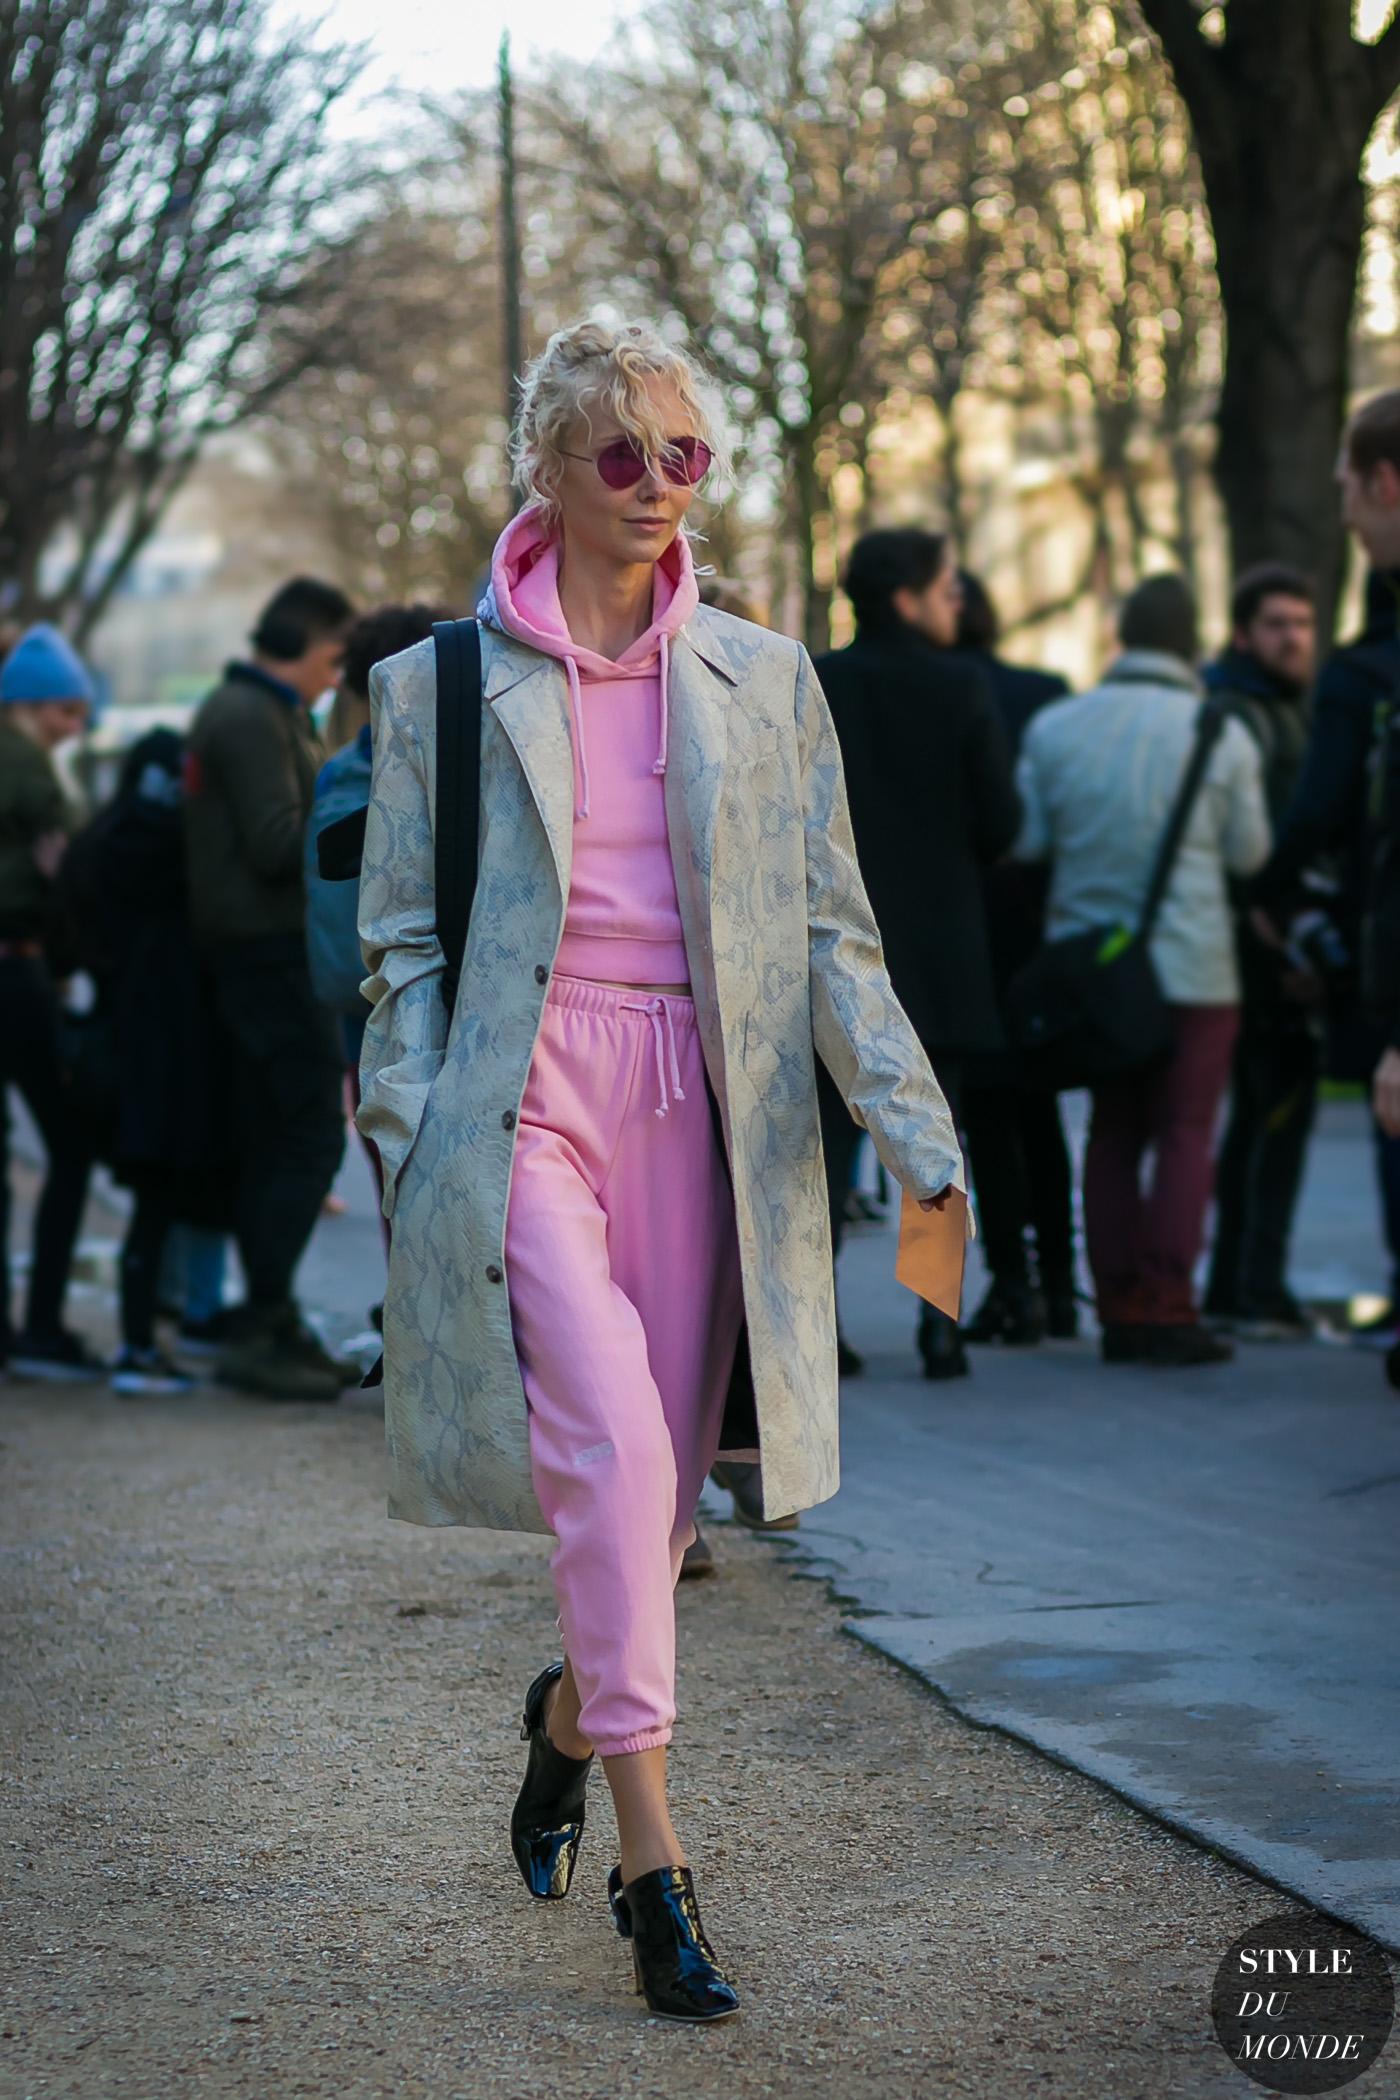 Photo via http://www.styledumonde.com/2017/03/paris-fashion-week-fall-2017-street-style-olga-karput-pink/